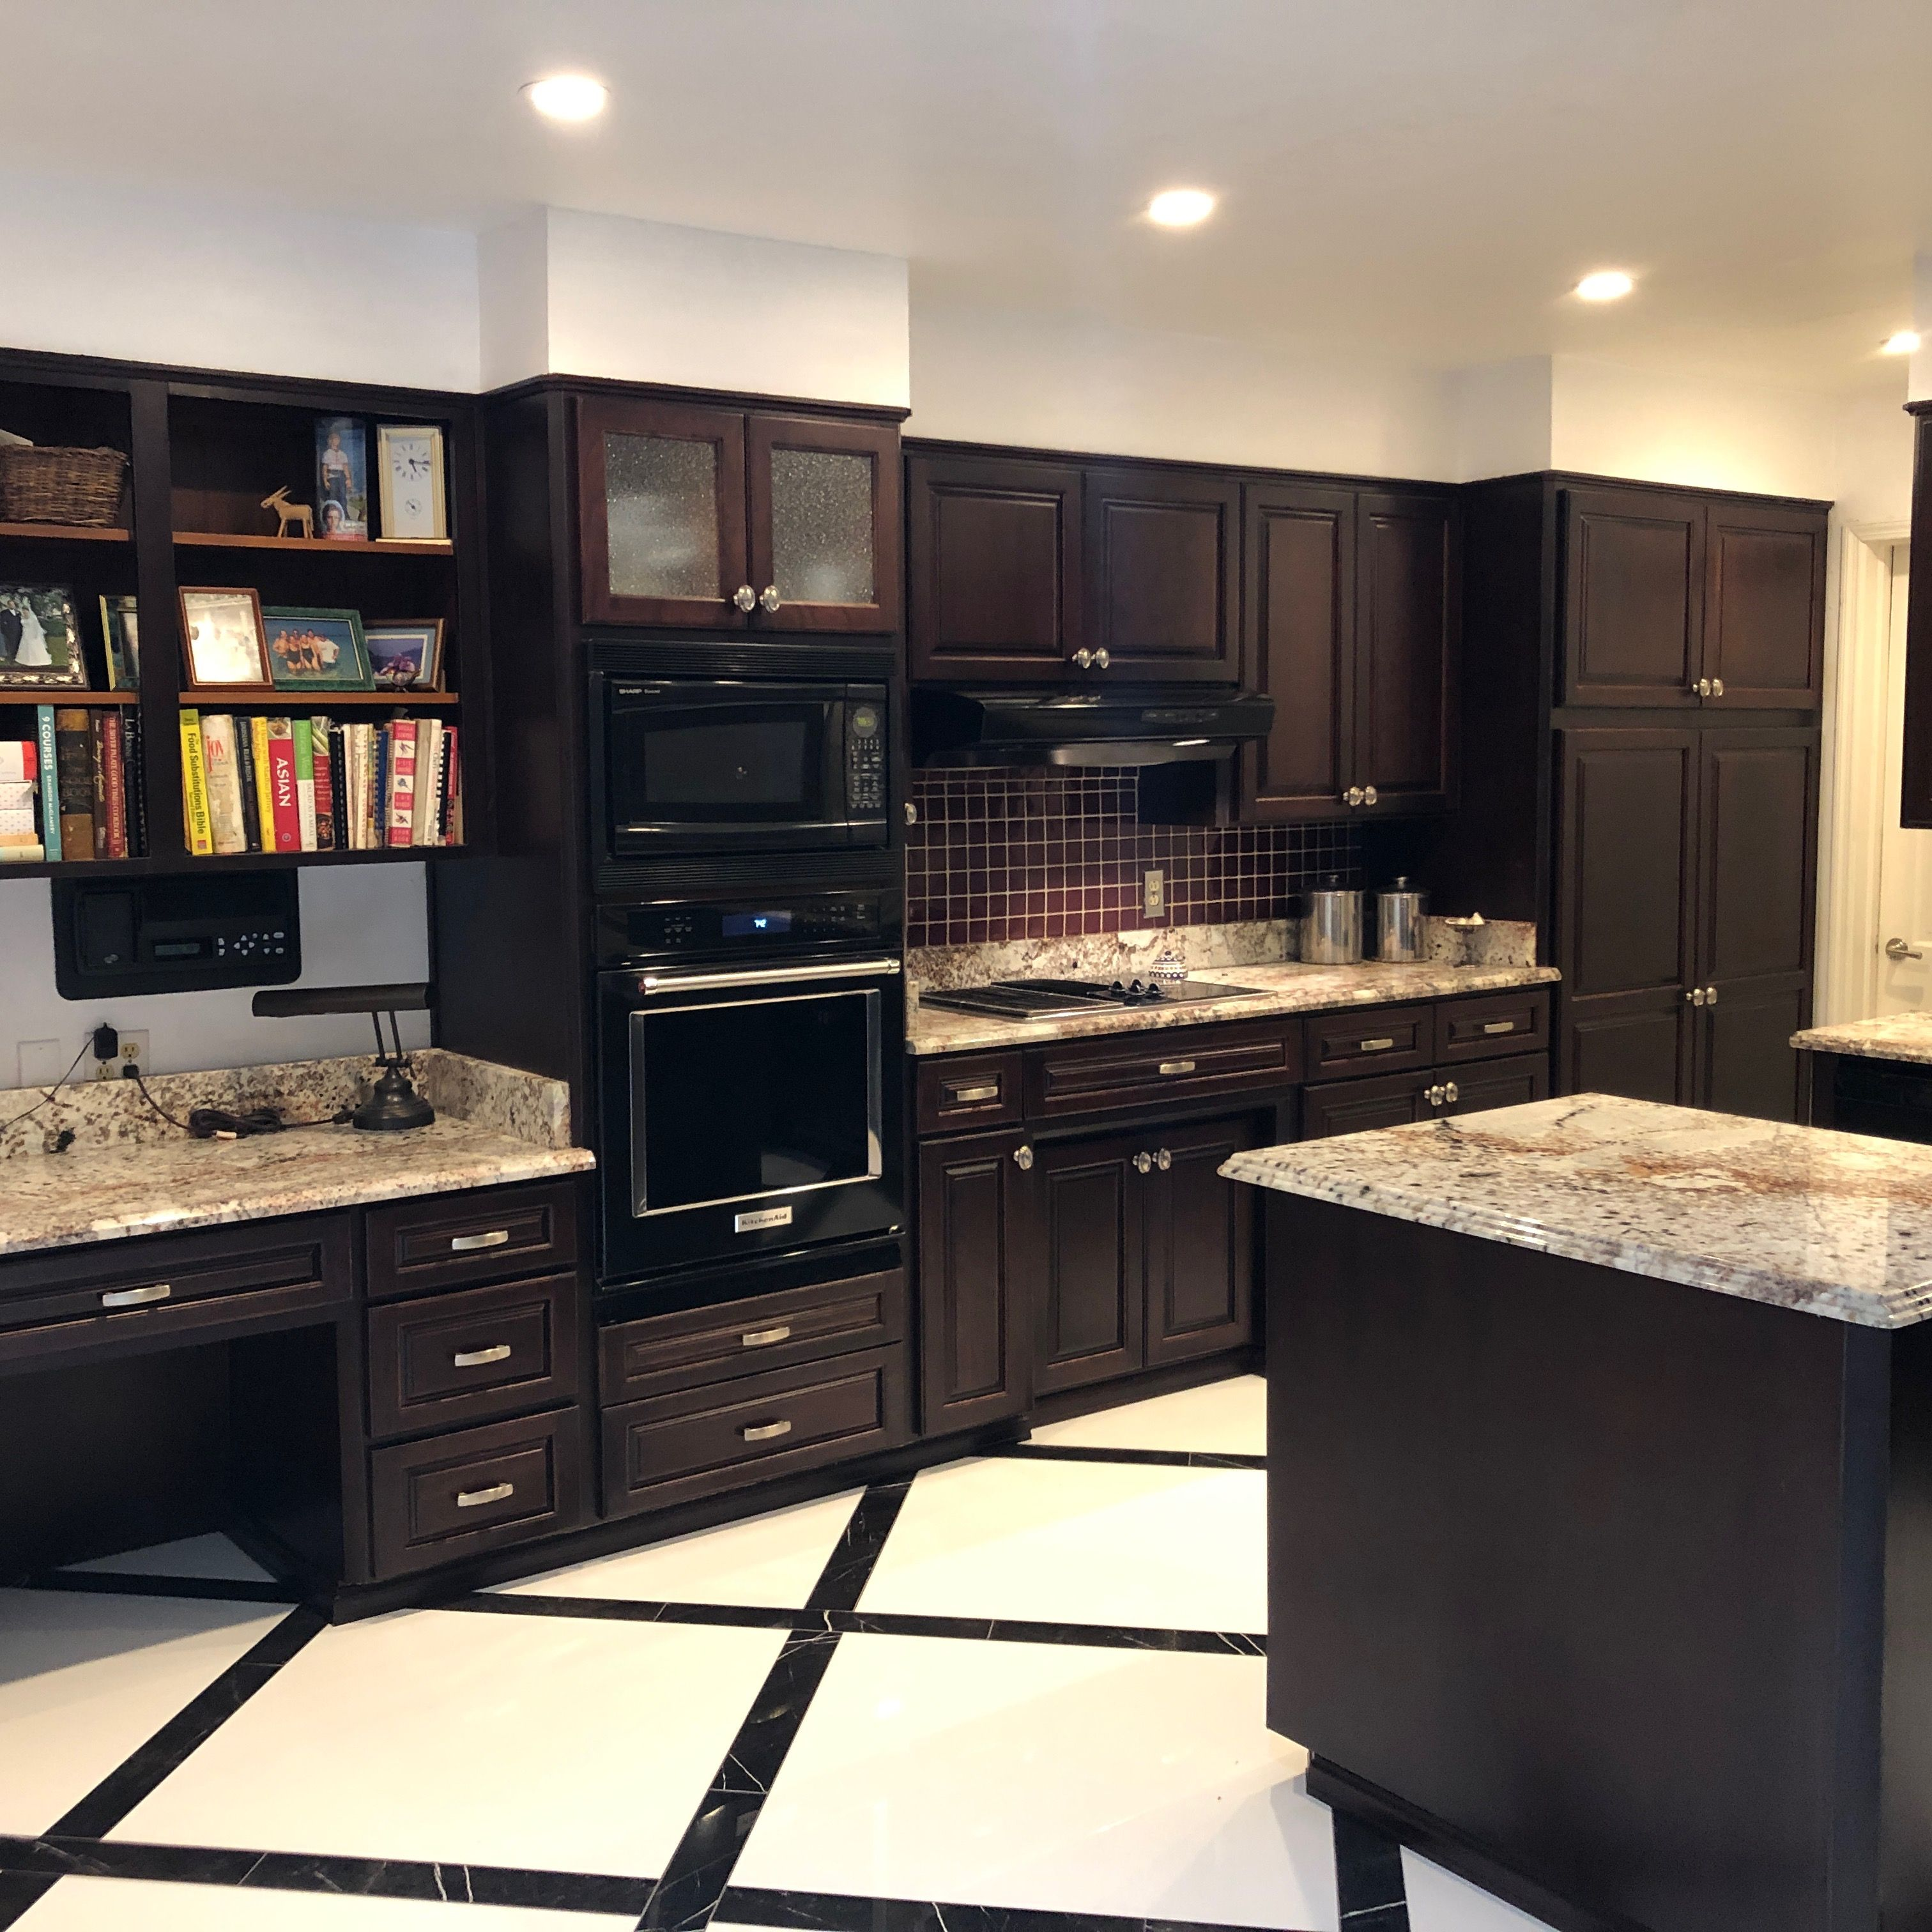 Pin by Patty Hurter on Maine Kitchen | Kitchen, Home decor ...